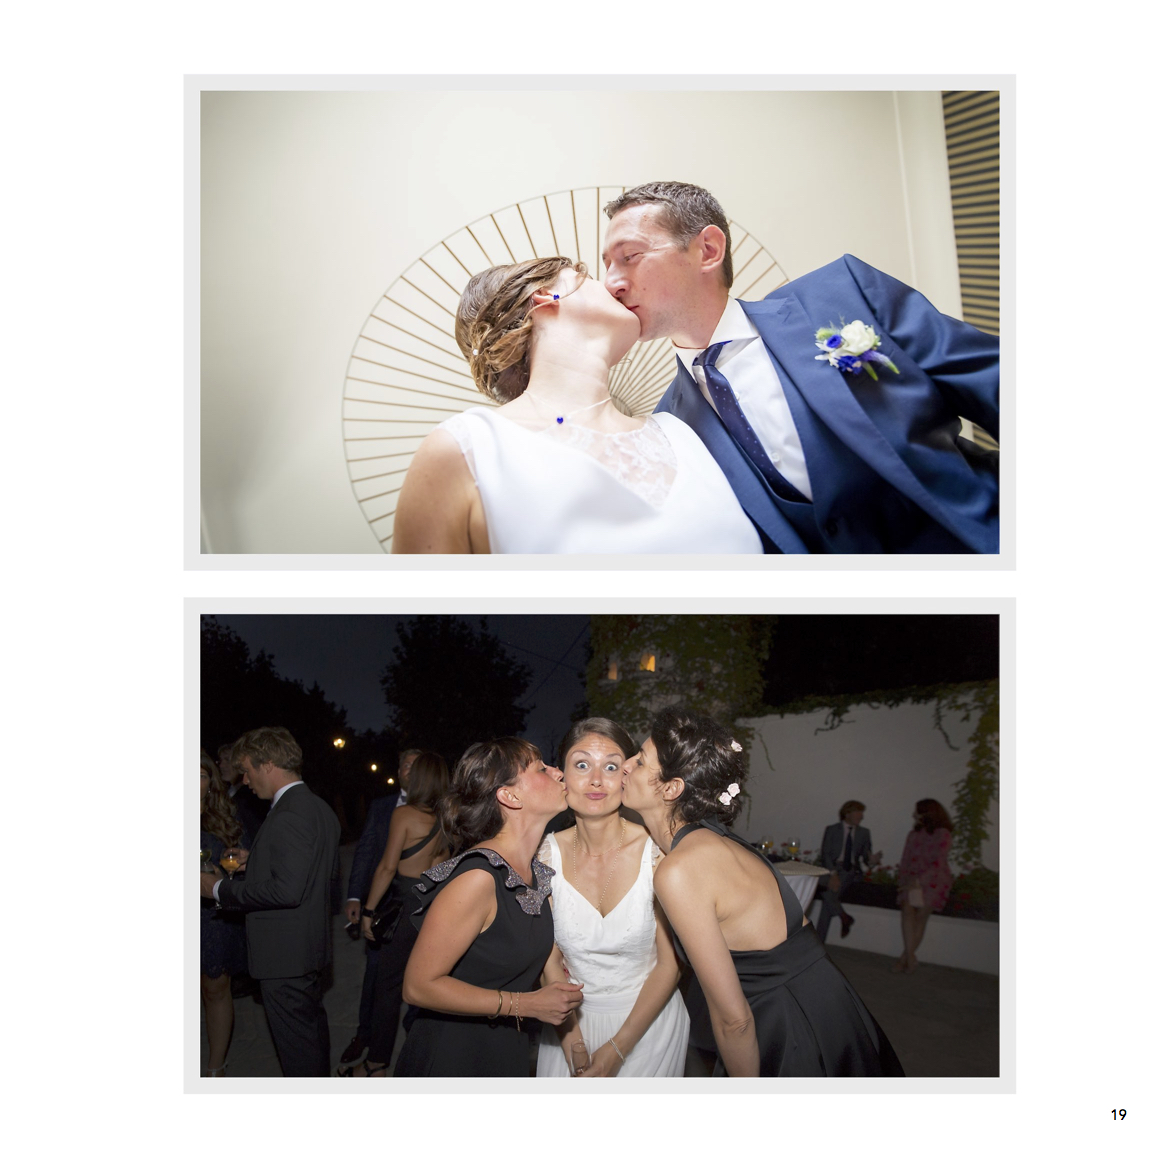 SALON DU MARIAGE 2016 21.jpg